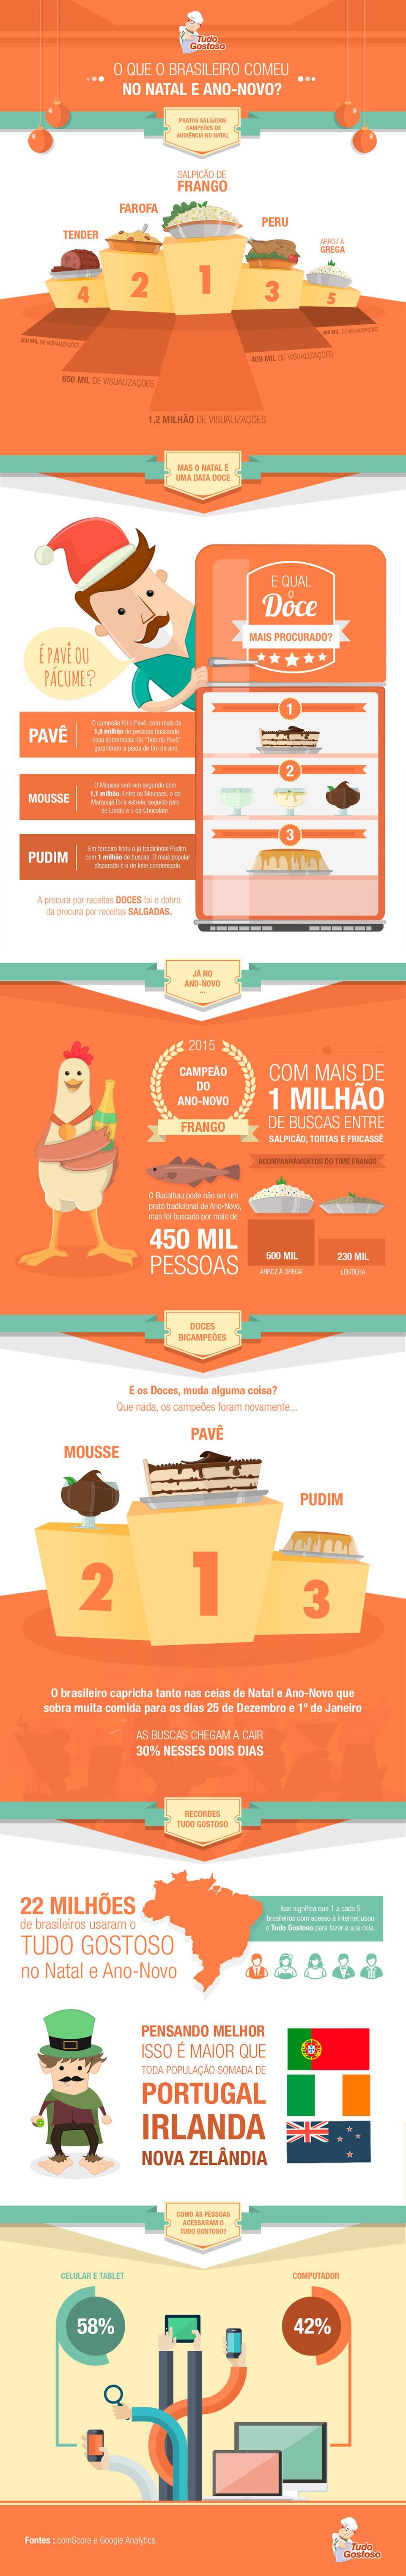 O que o brasileiro comeu no Natal e no Ano-Novo? [infográfico]